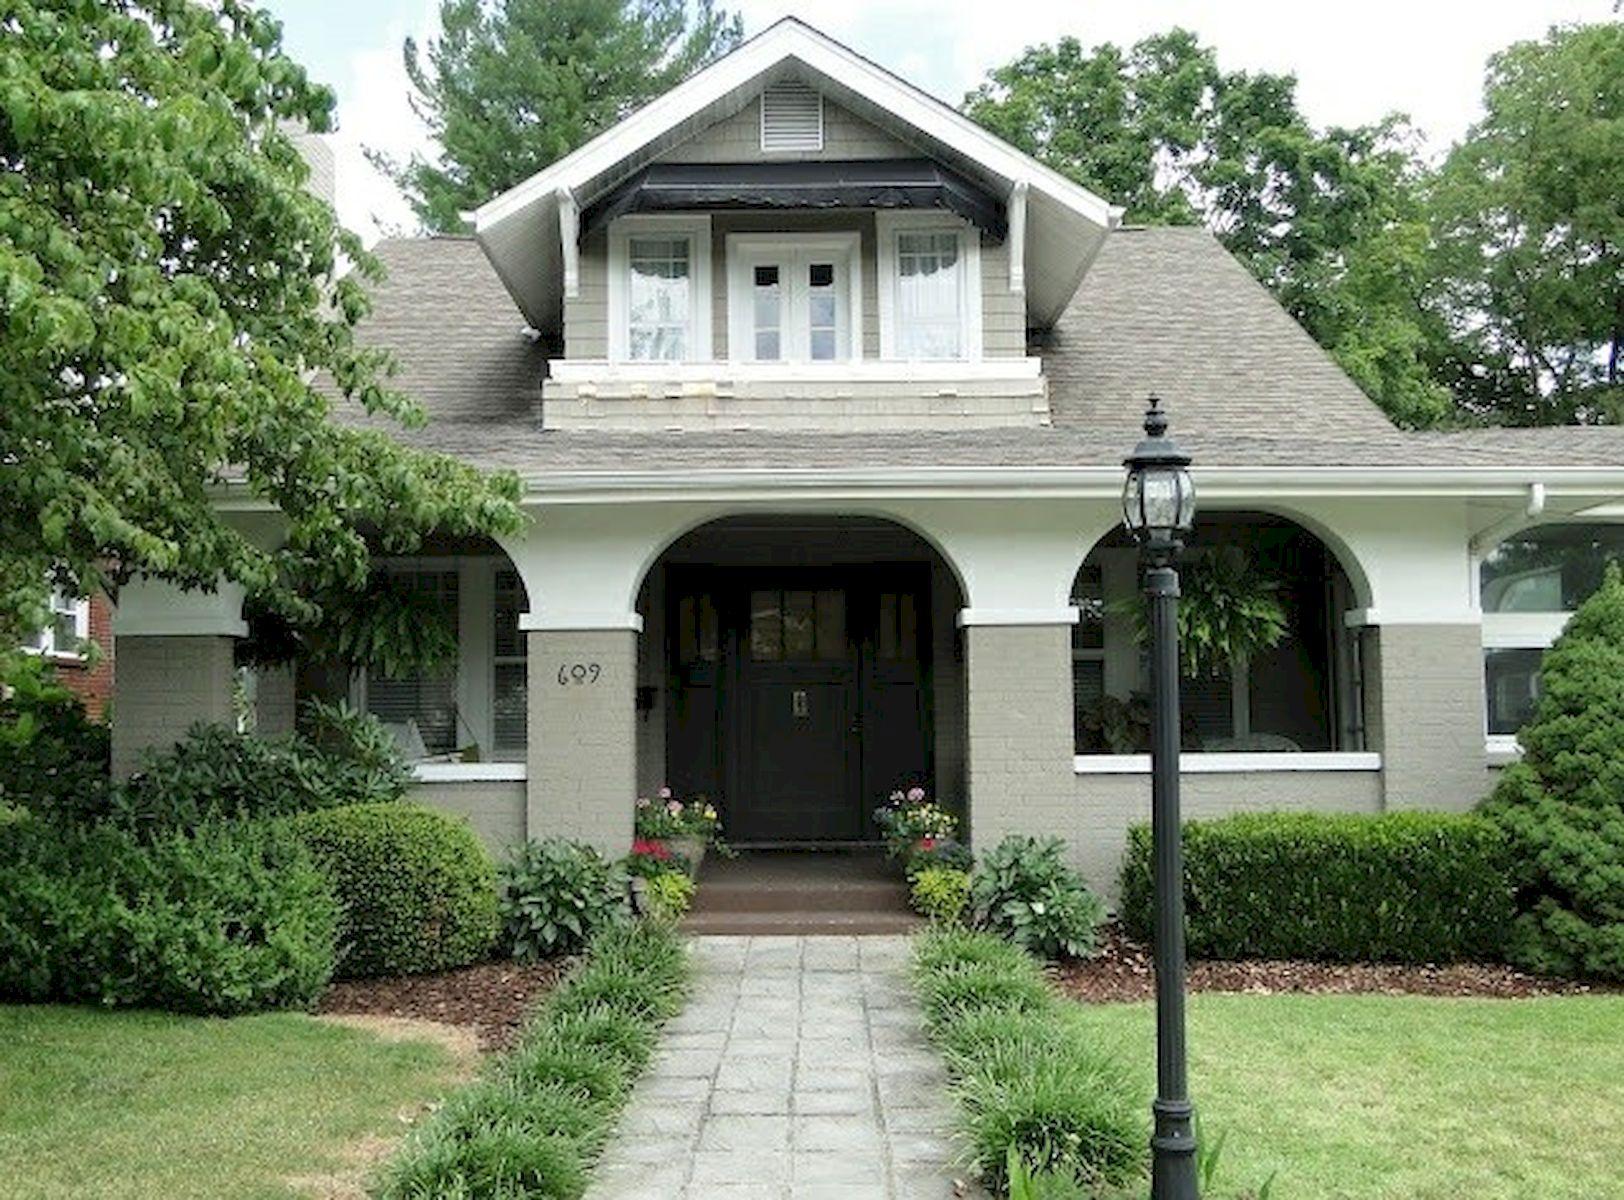 70 Stunning Exterior House Design Ideas (46)